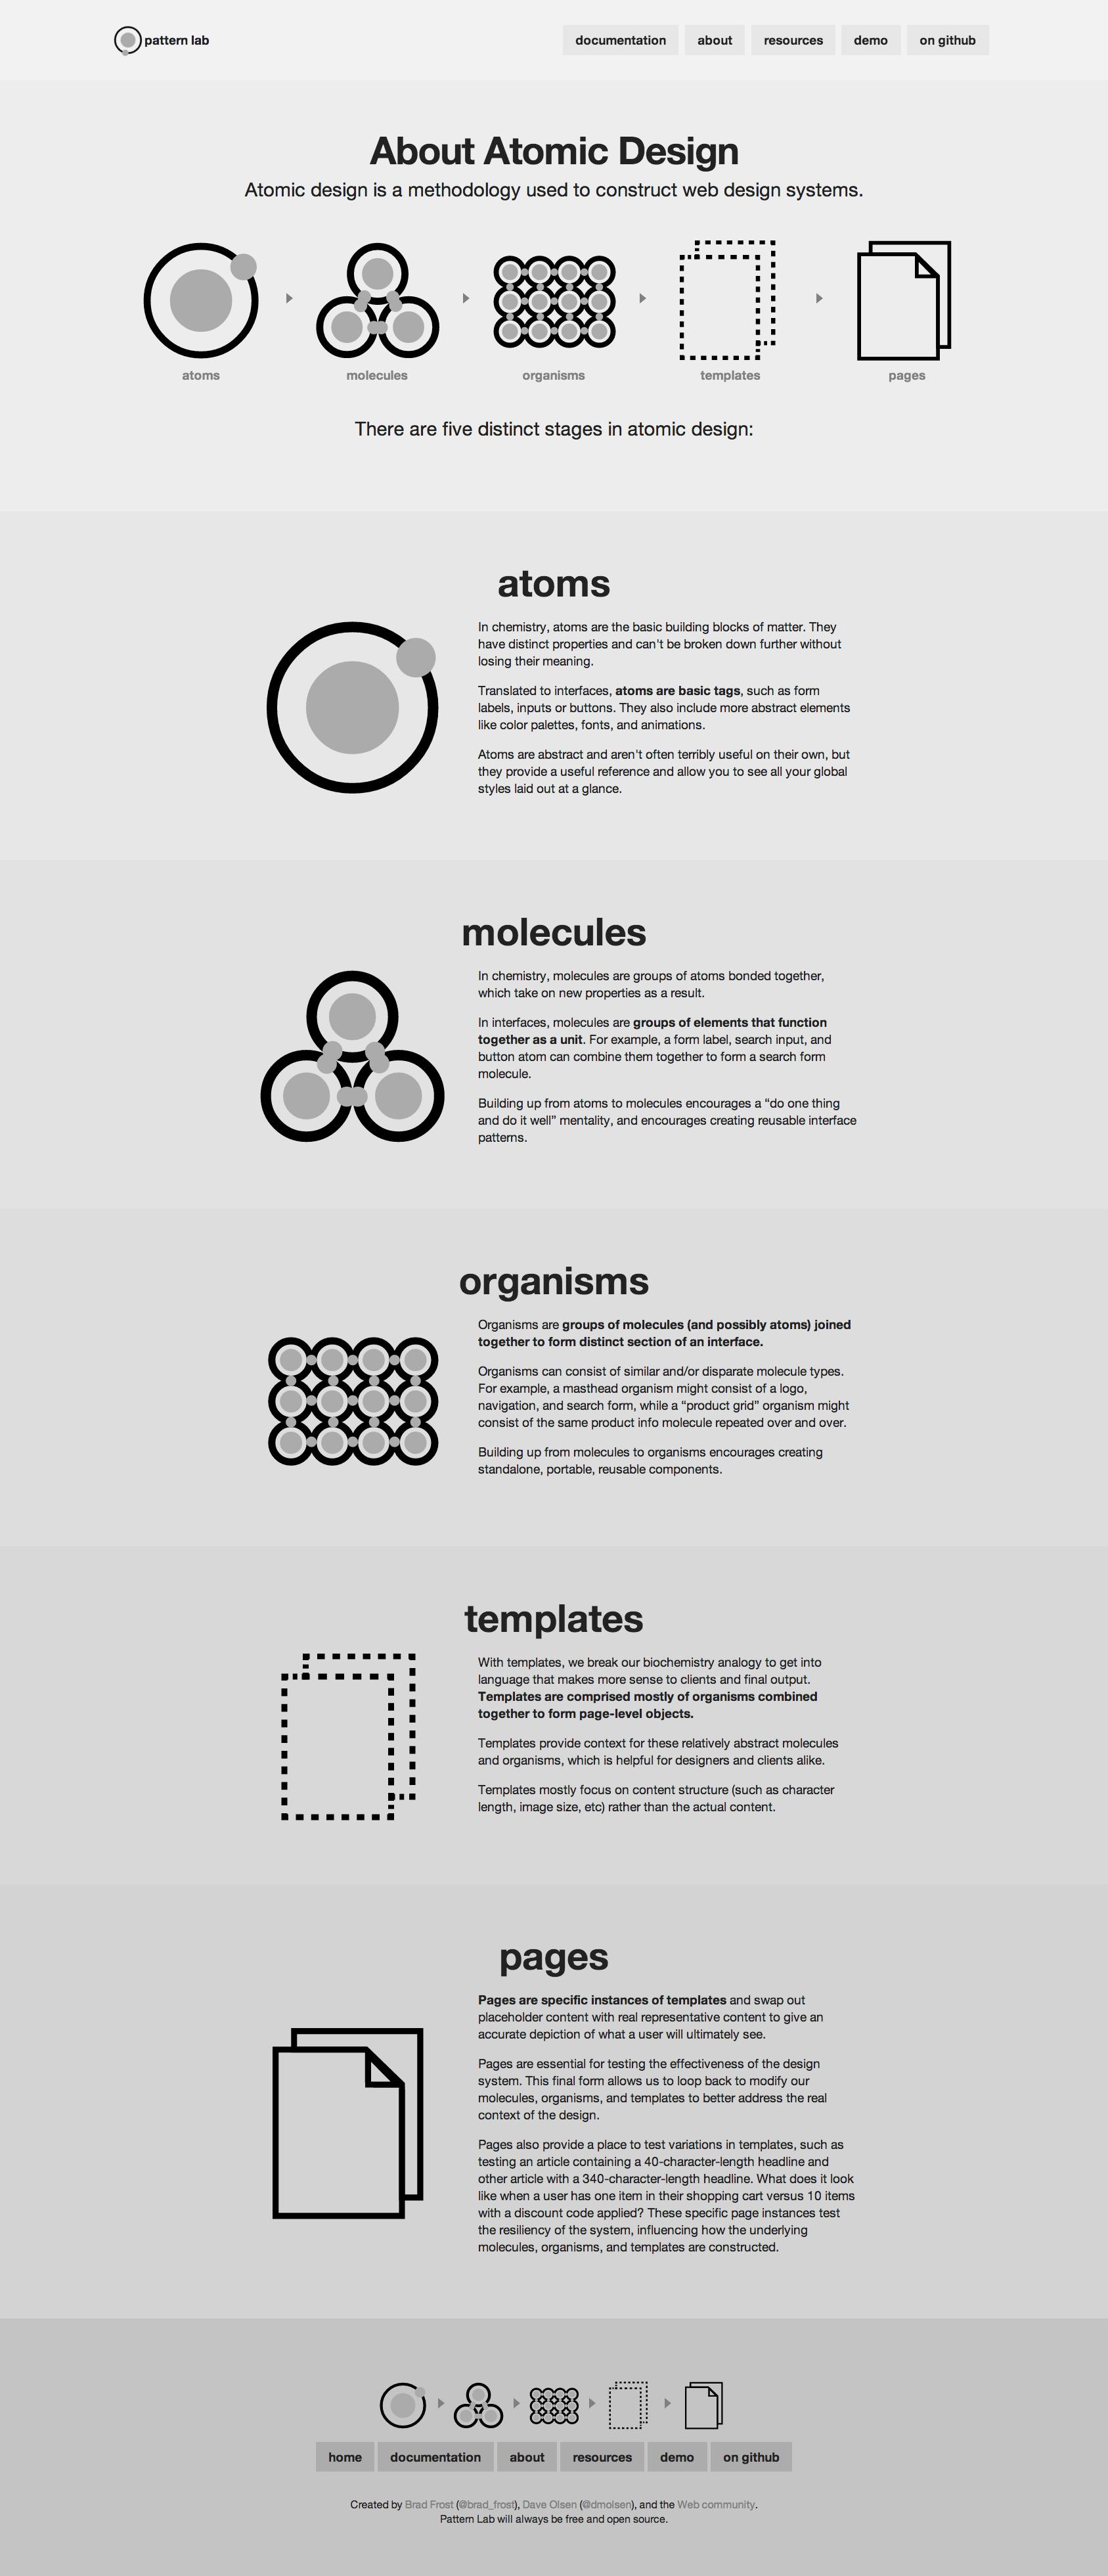 5 Distinct Stages to Atomic Design: Atoms Molecules Organisms ...